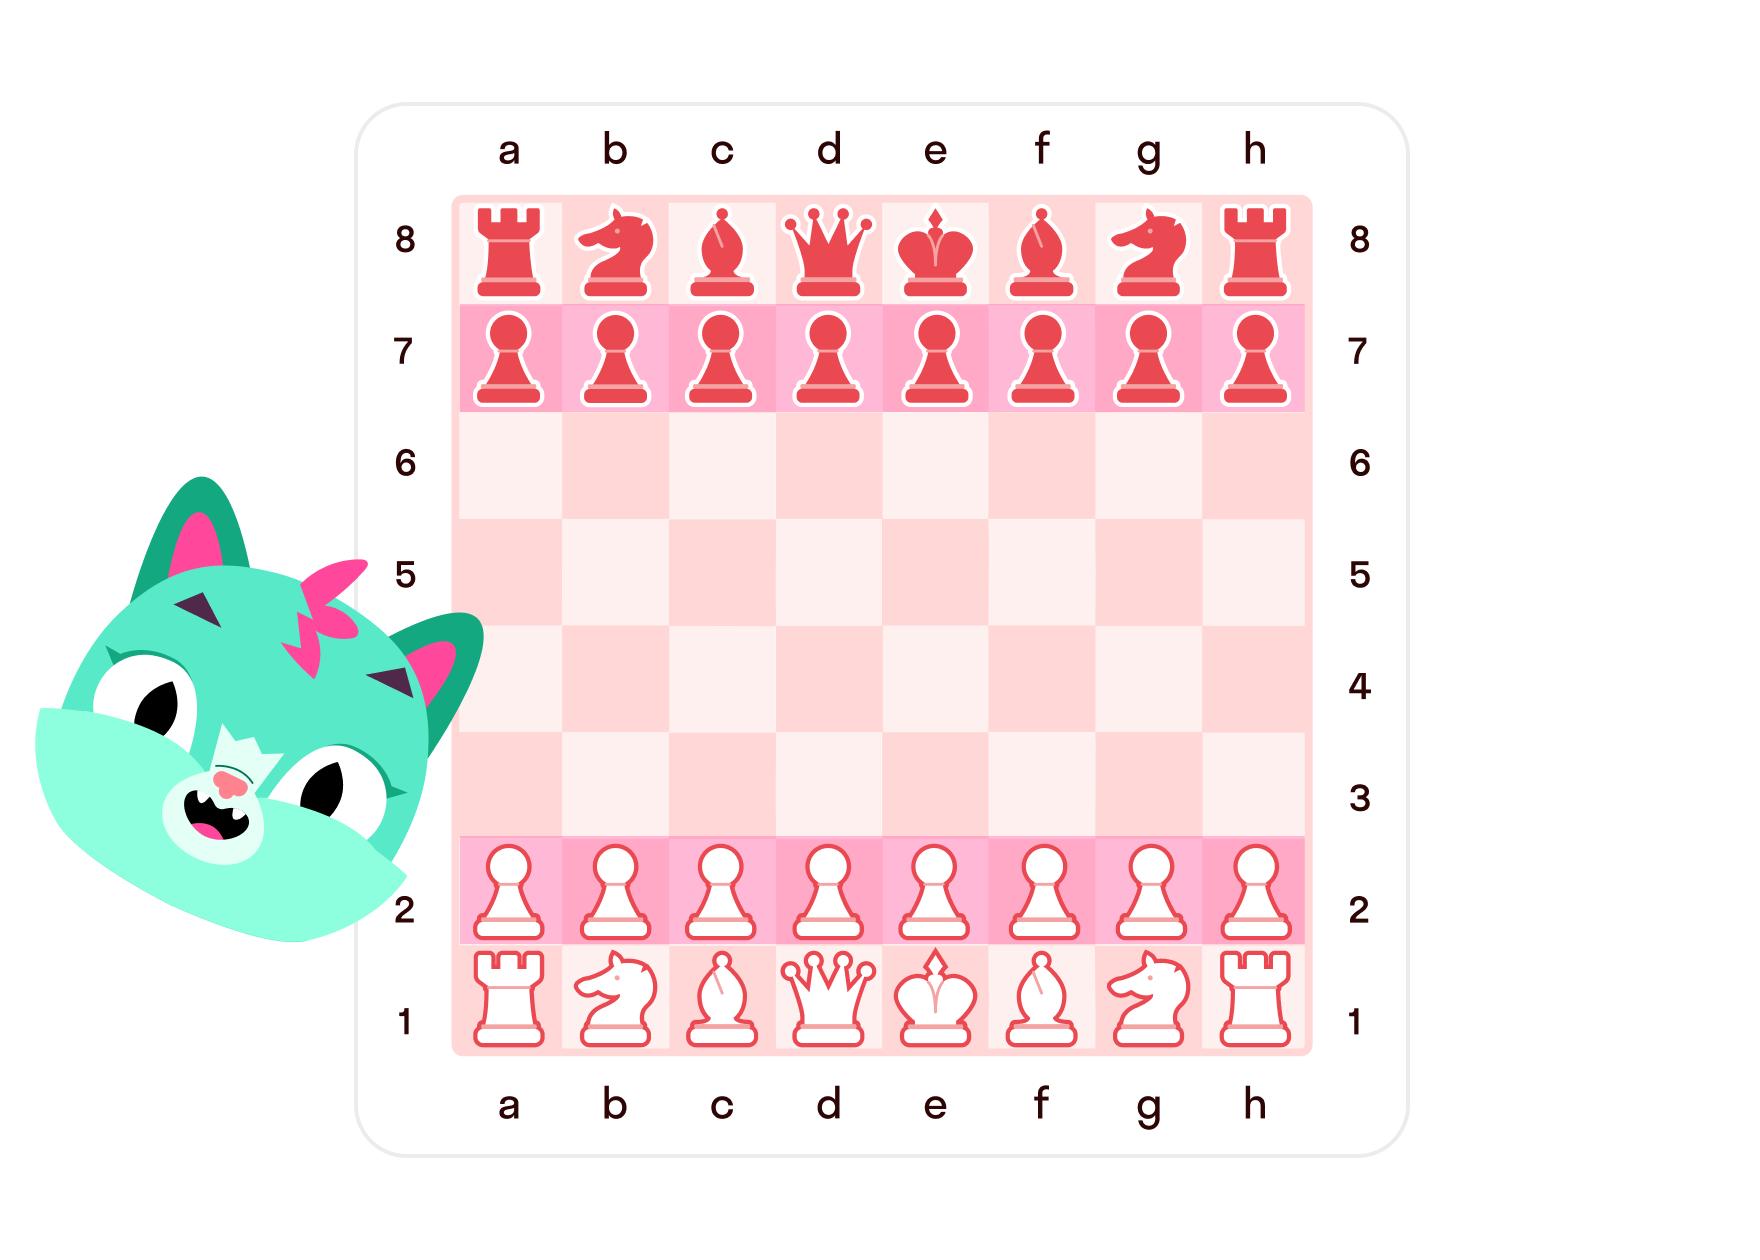 Где на шахматной доске стоят пешки